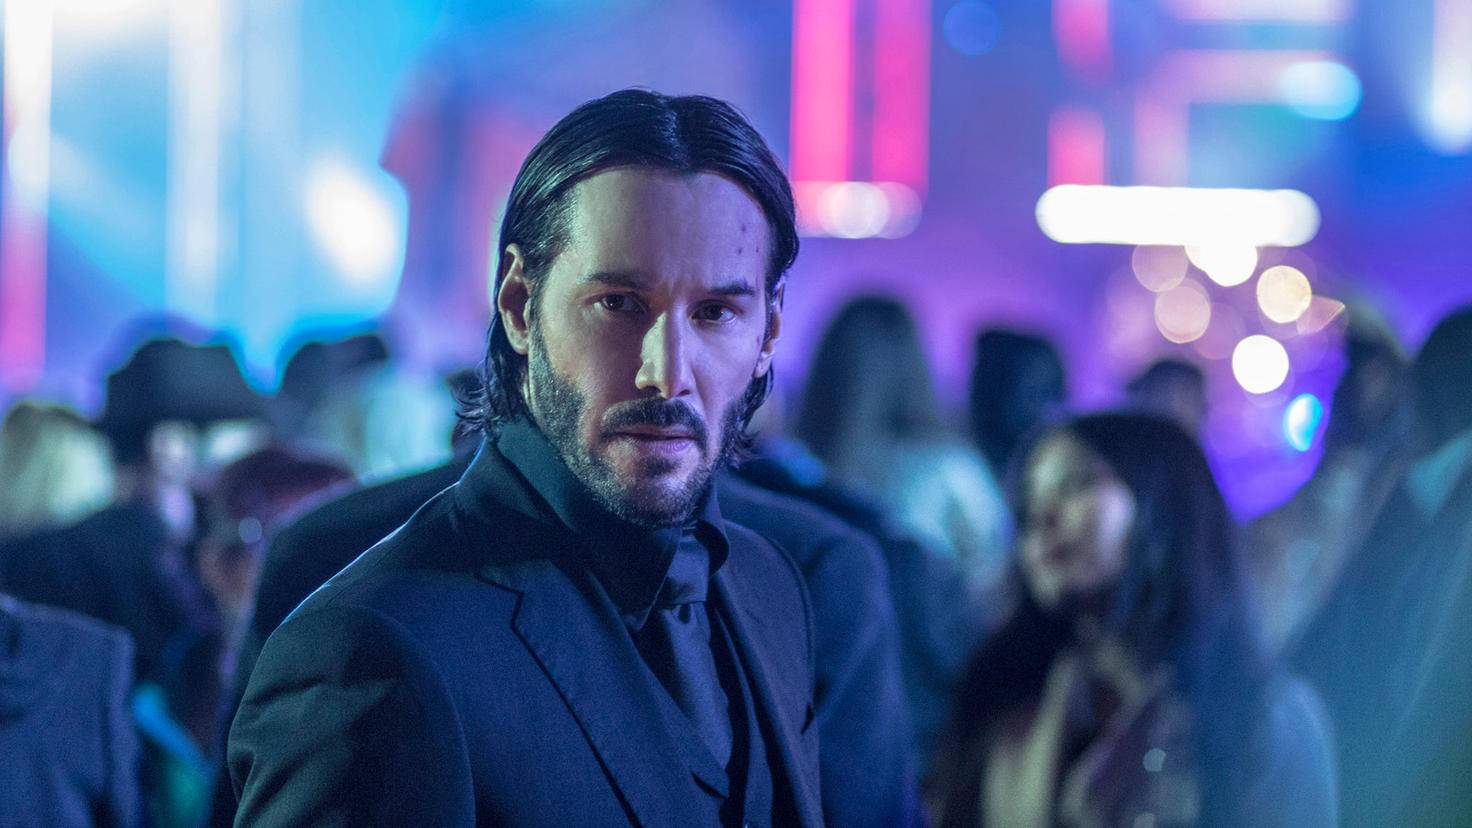 John Wick Kapitel 2 Keanu Reeves